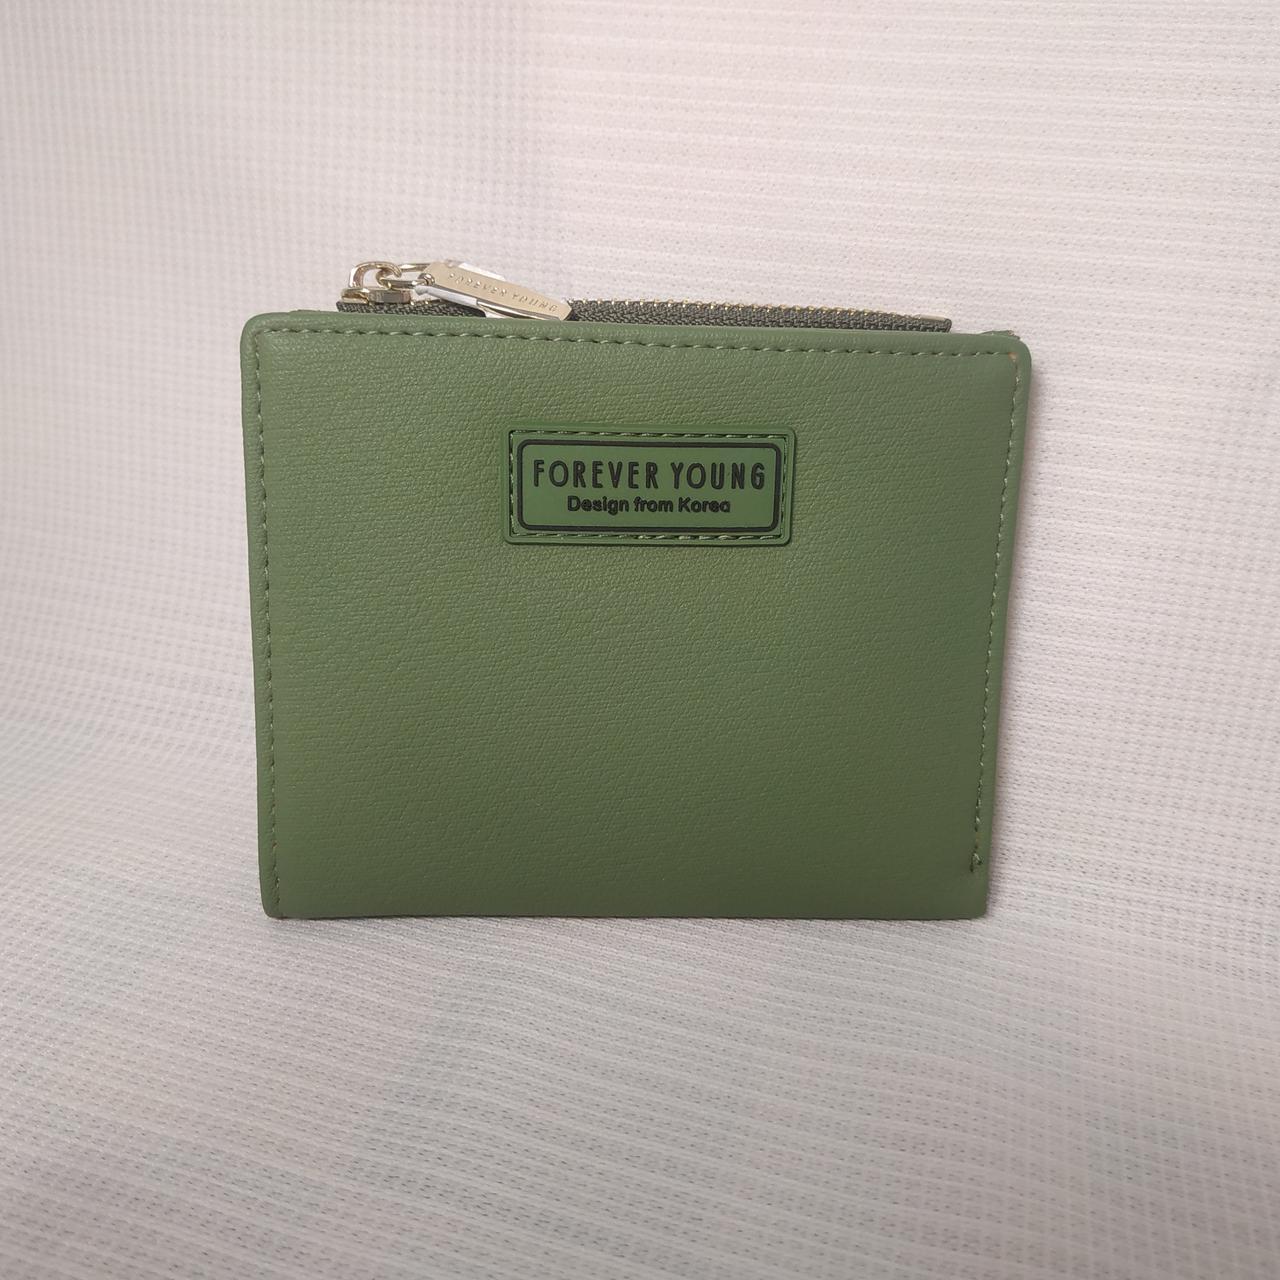 Жіночий гаманець / Женский кошелек